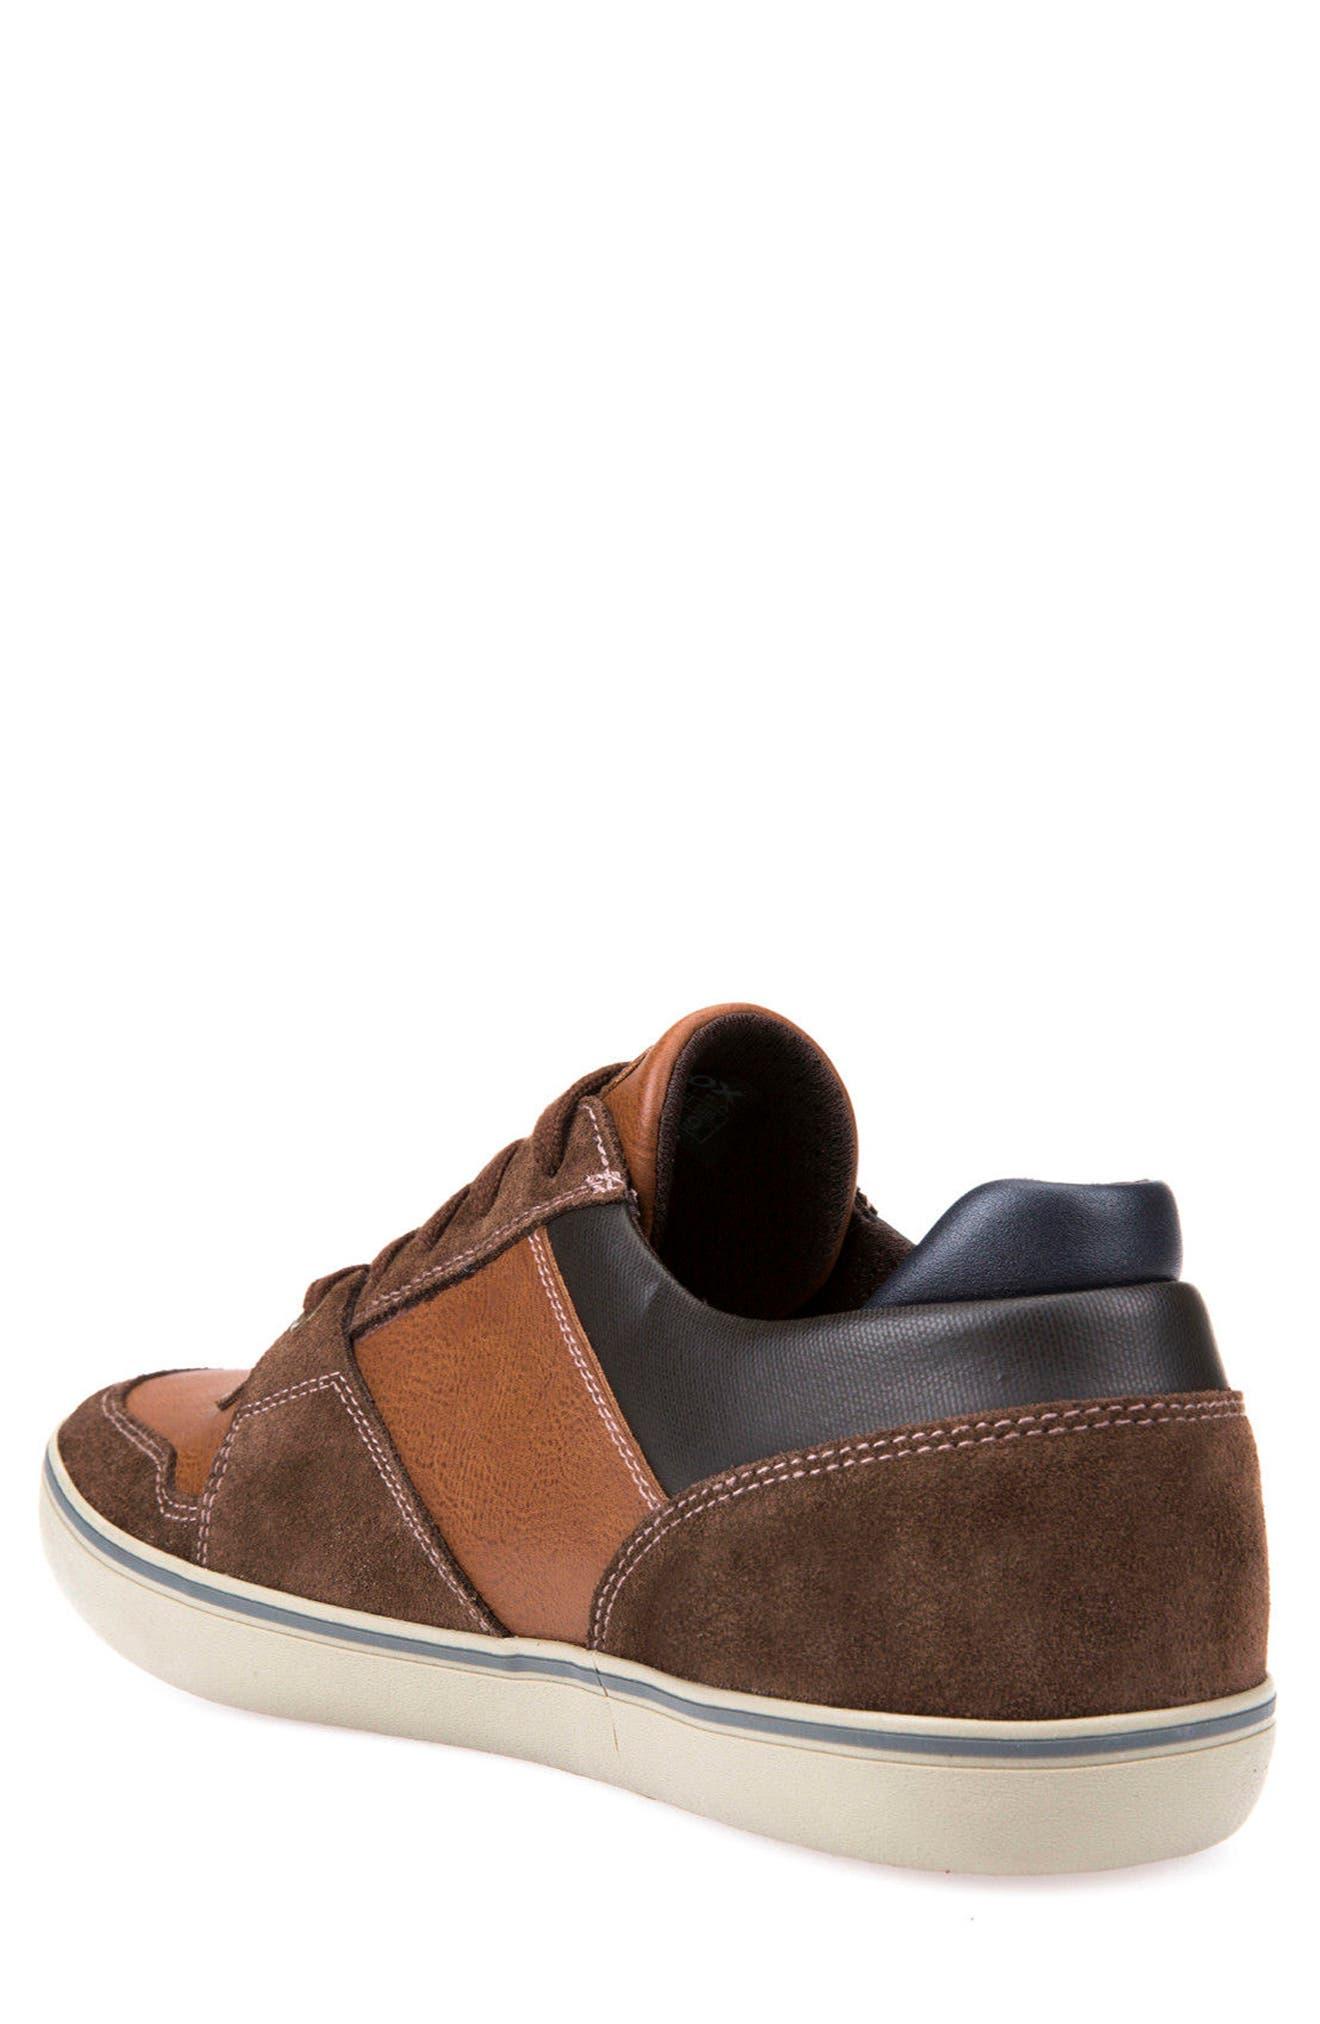 Box 27 Low-Top Sneaker,                             Alternate thumbnail 2, color,                             Ebony/ Brown Cotto